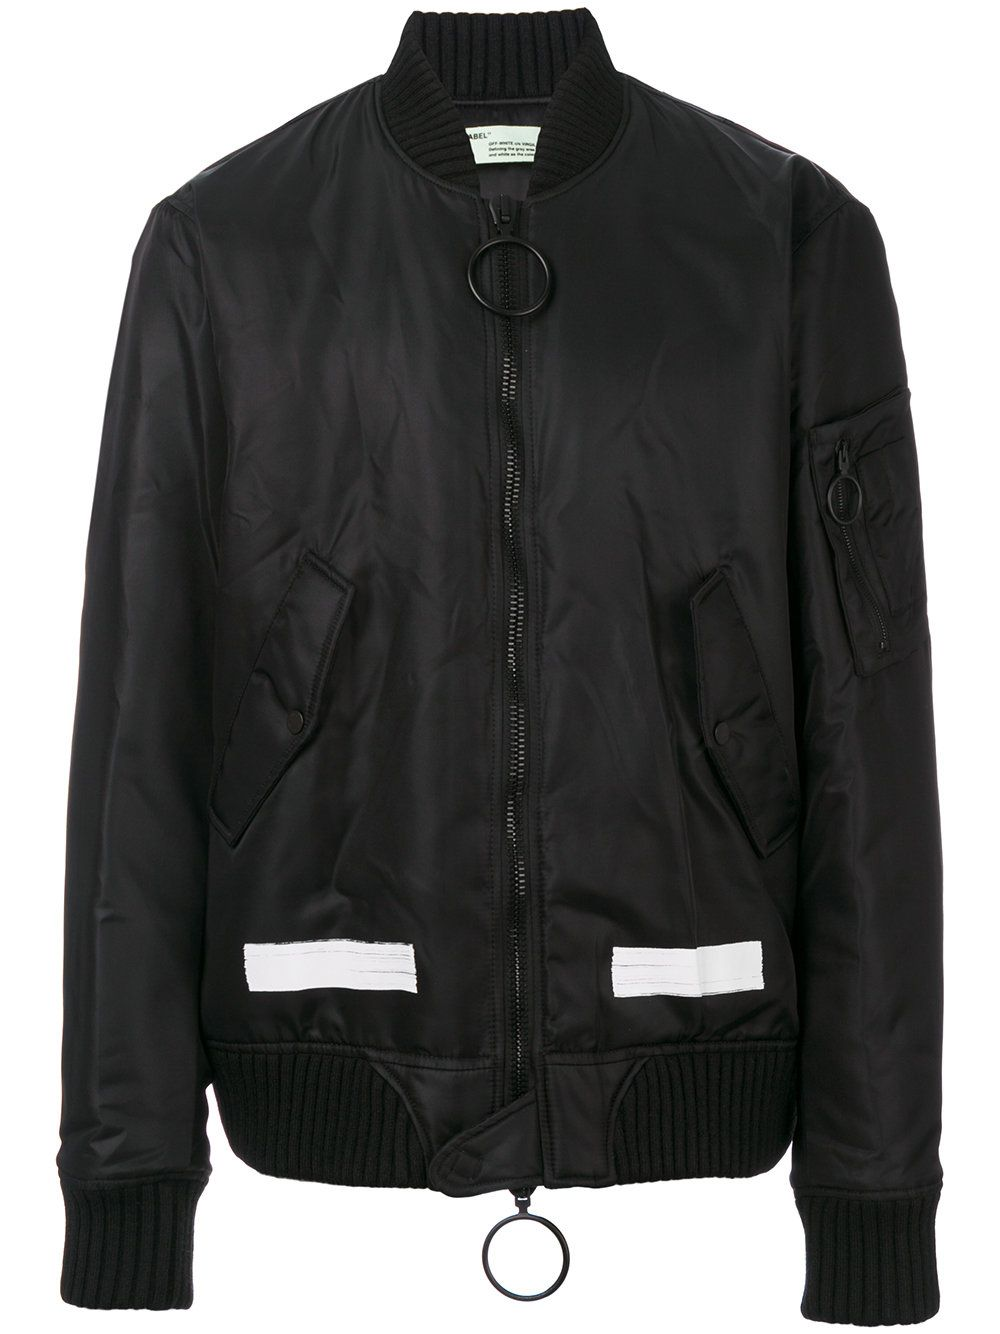 Off White Black Jacket 1142 [ 1334 x 1000 Pixel ]